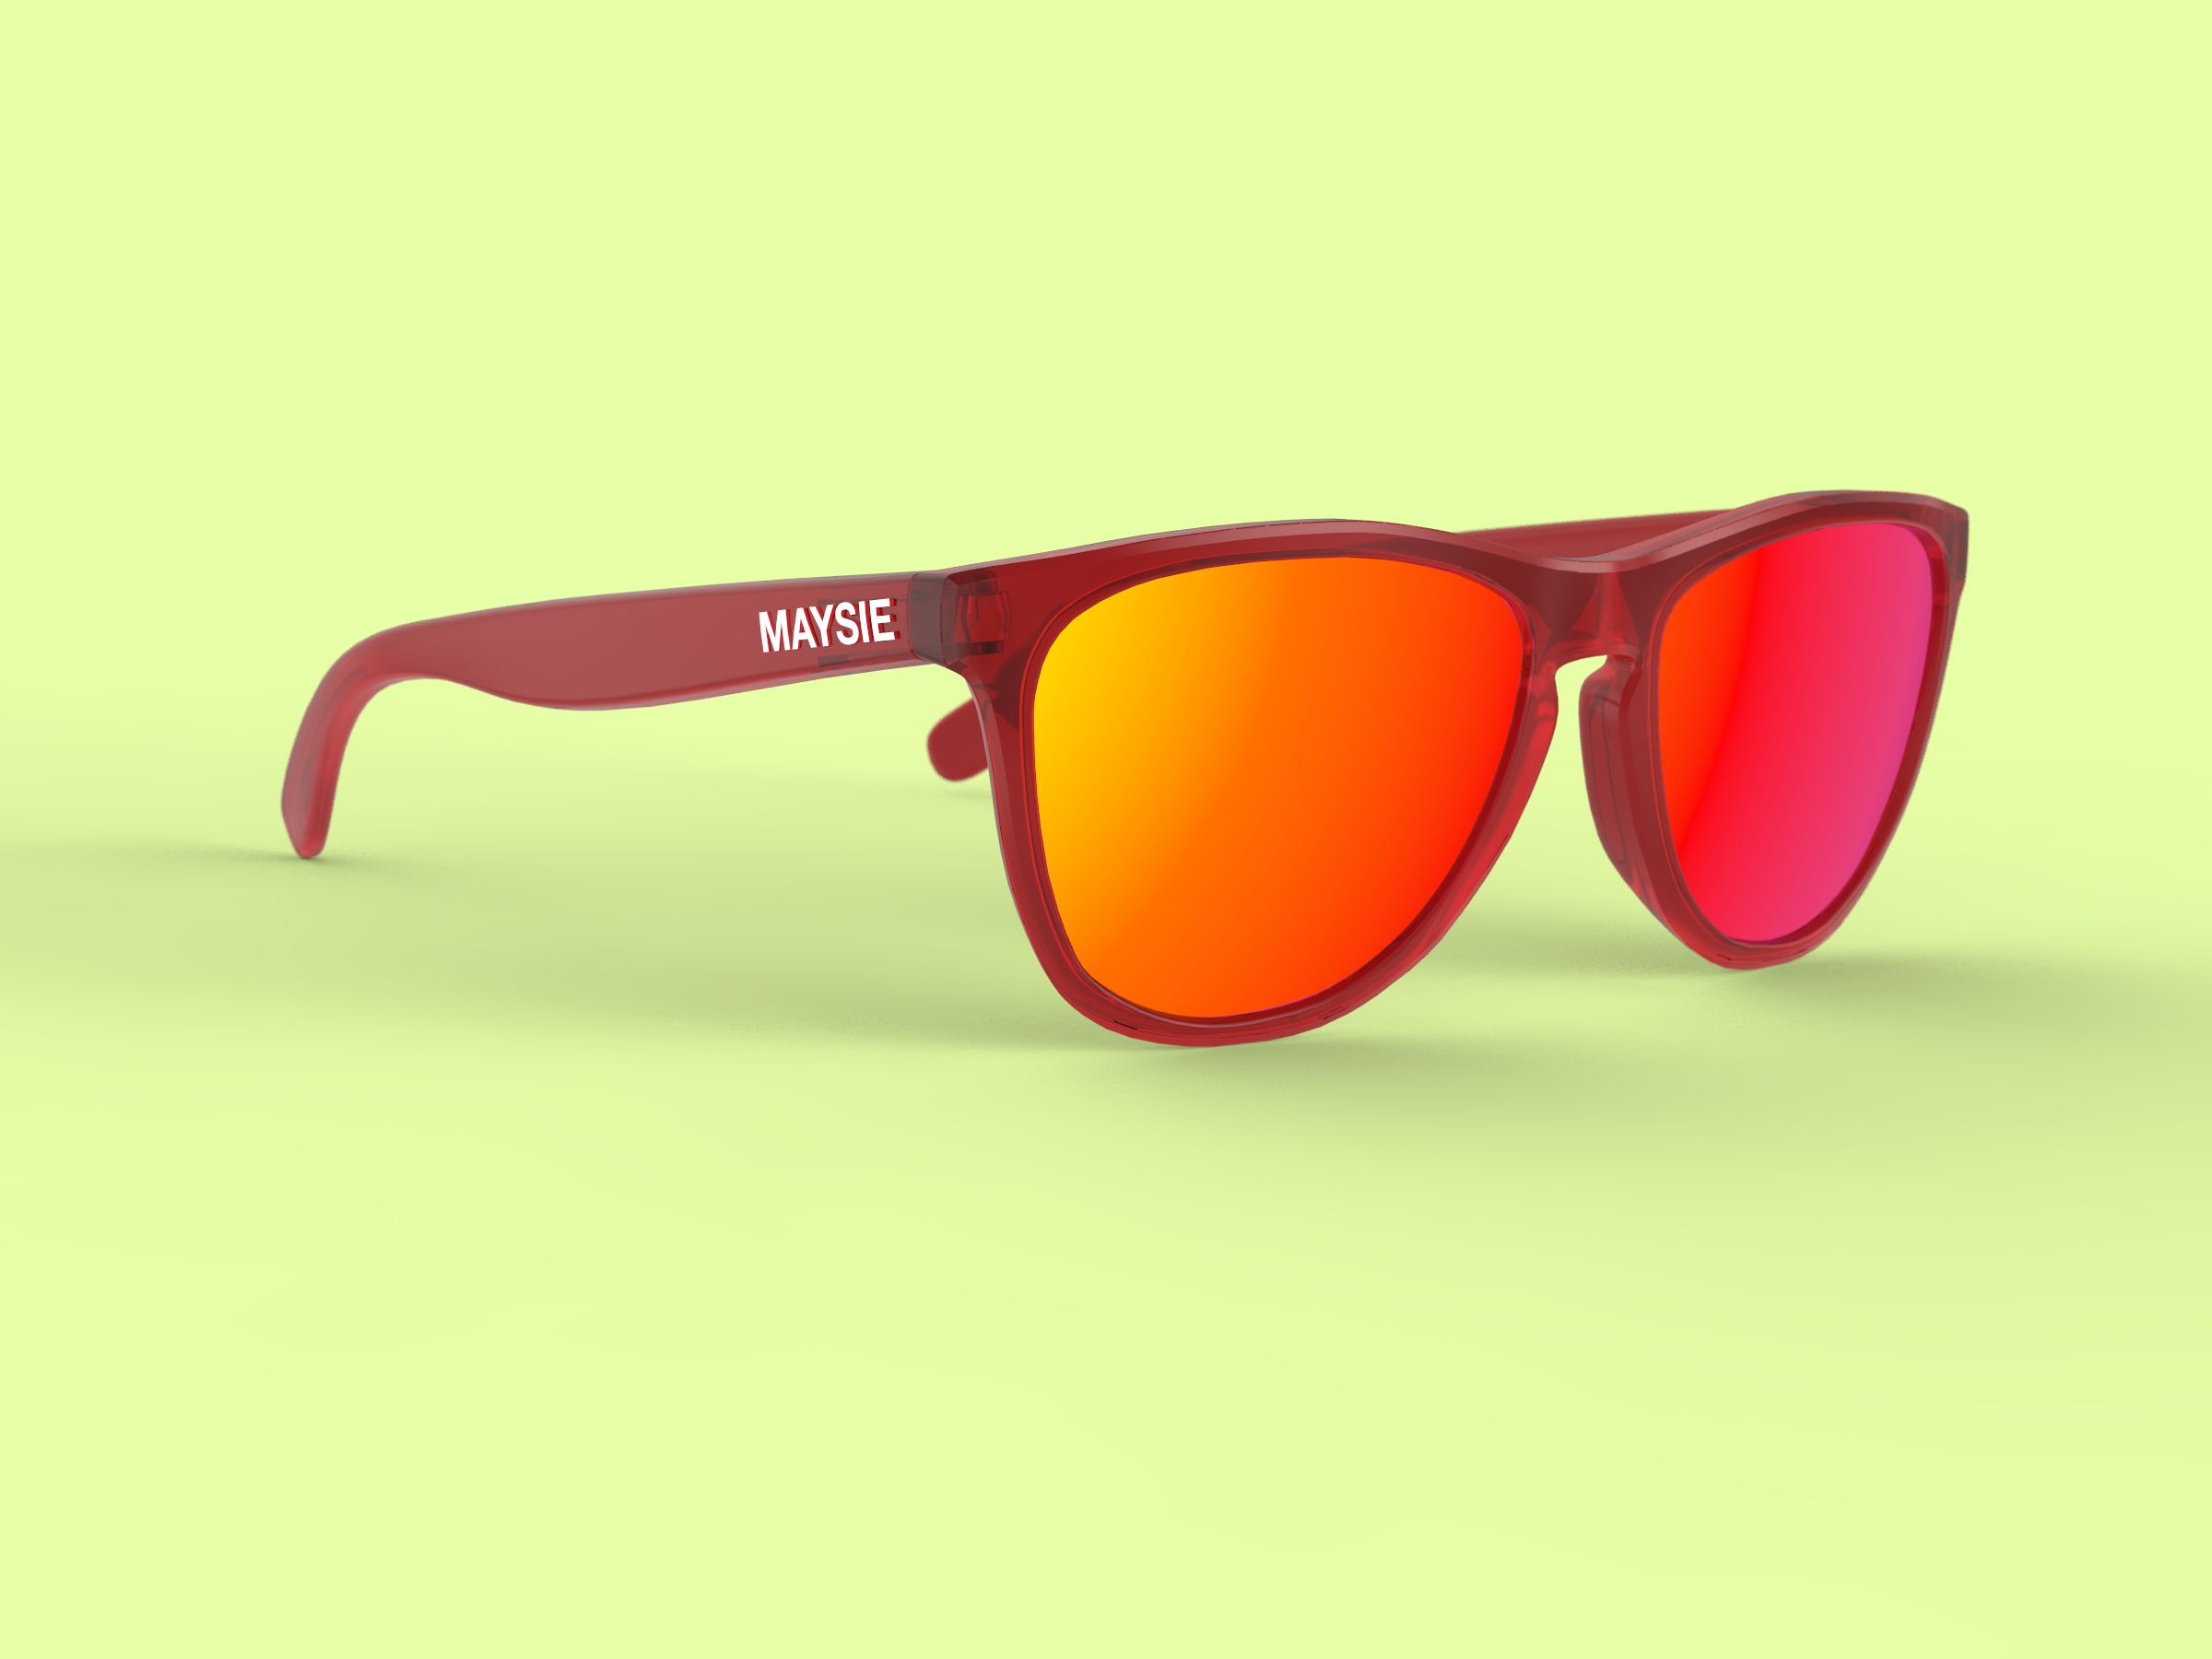 Maysie-glasses1-9-3500-3500